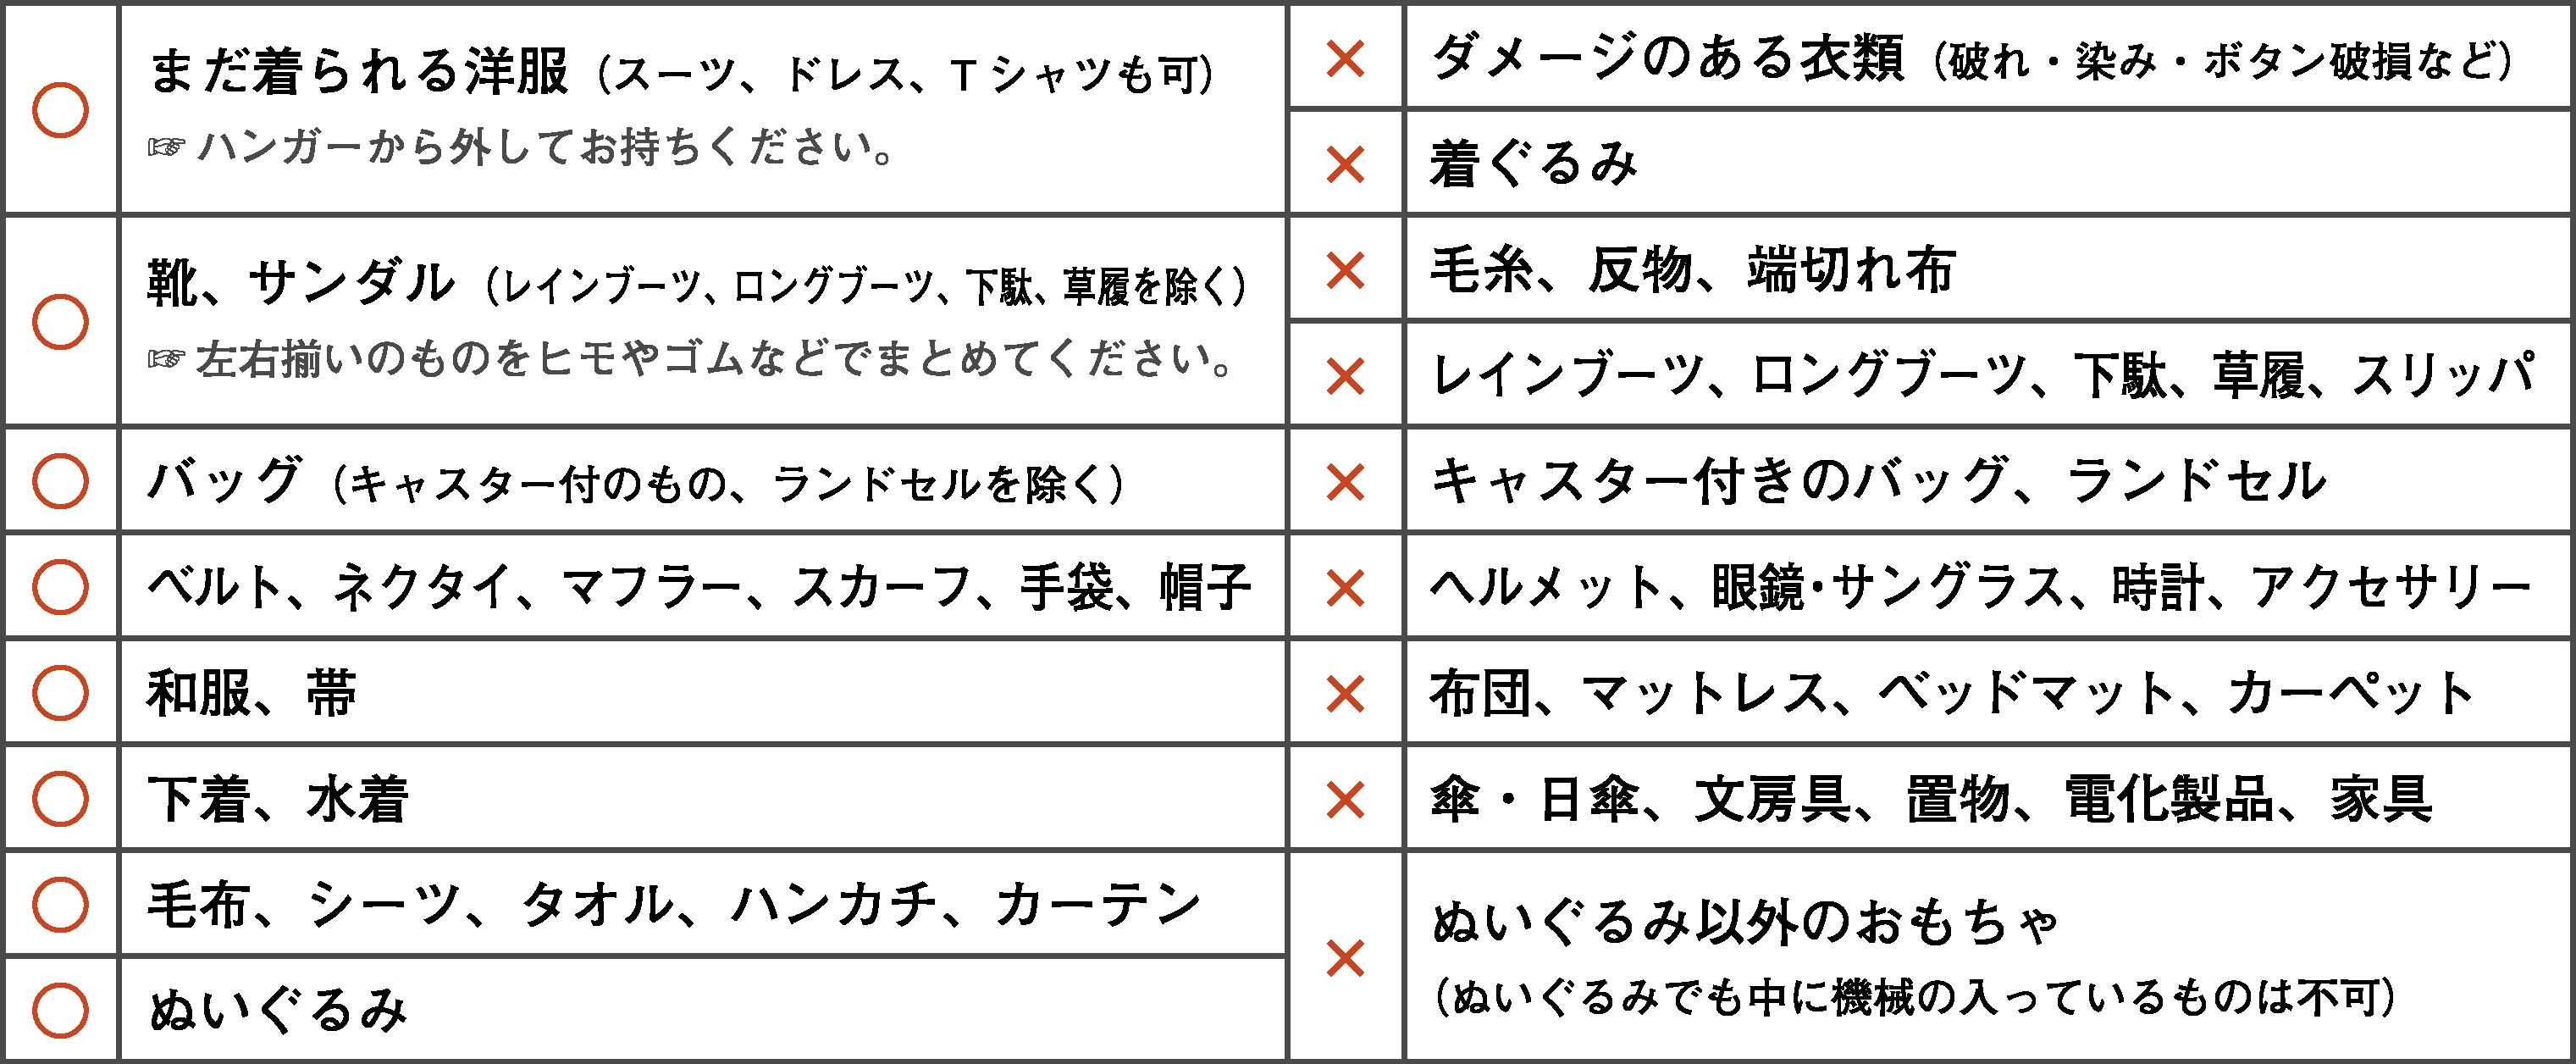 yp_hinmoku_20141207